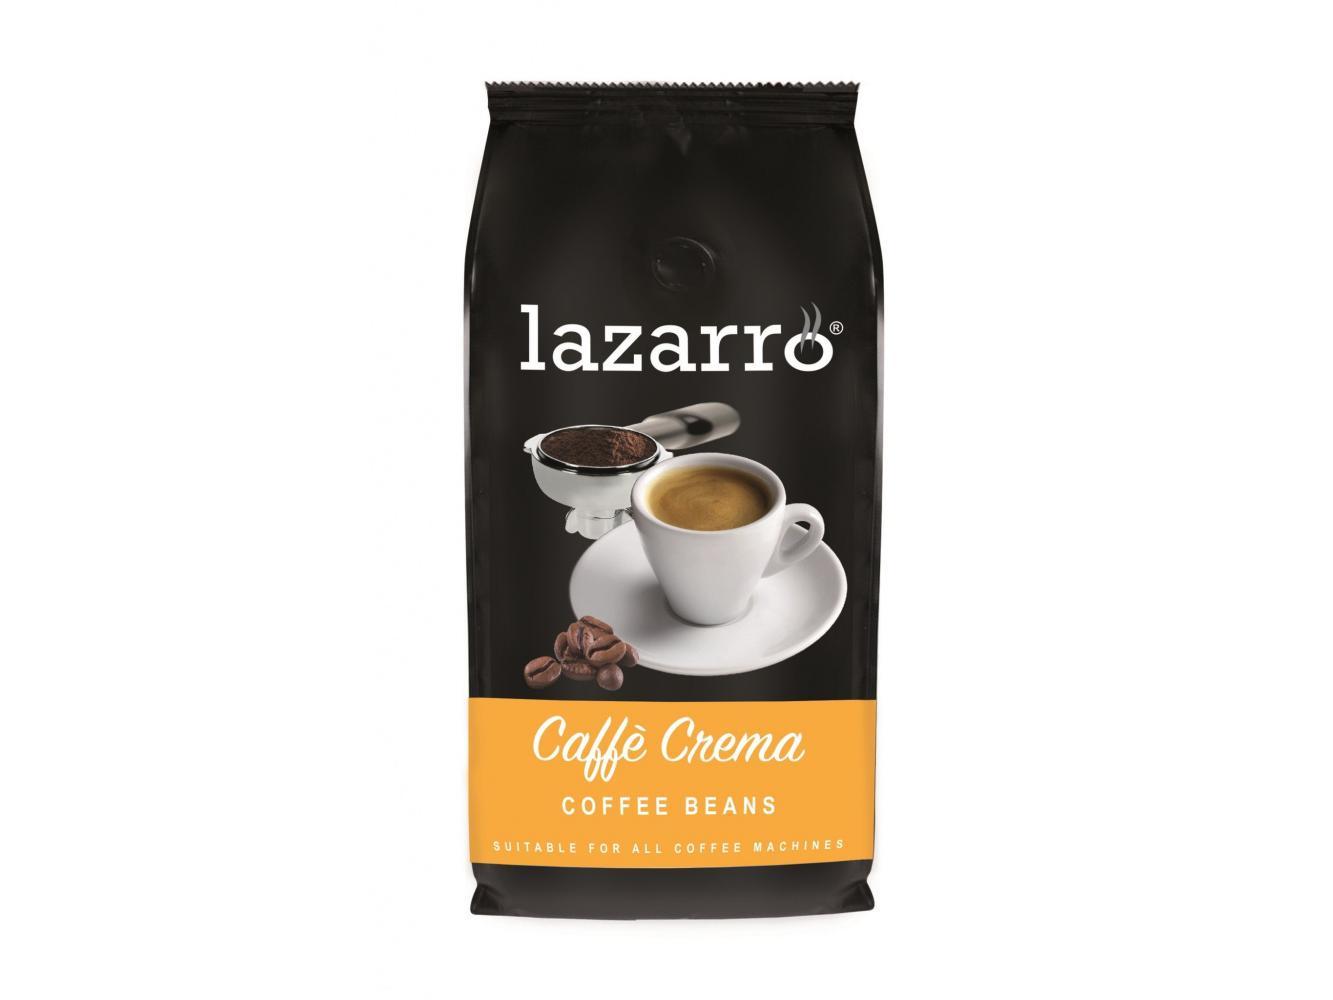 Lazarro Caffè Crema